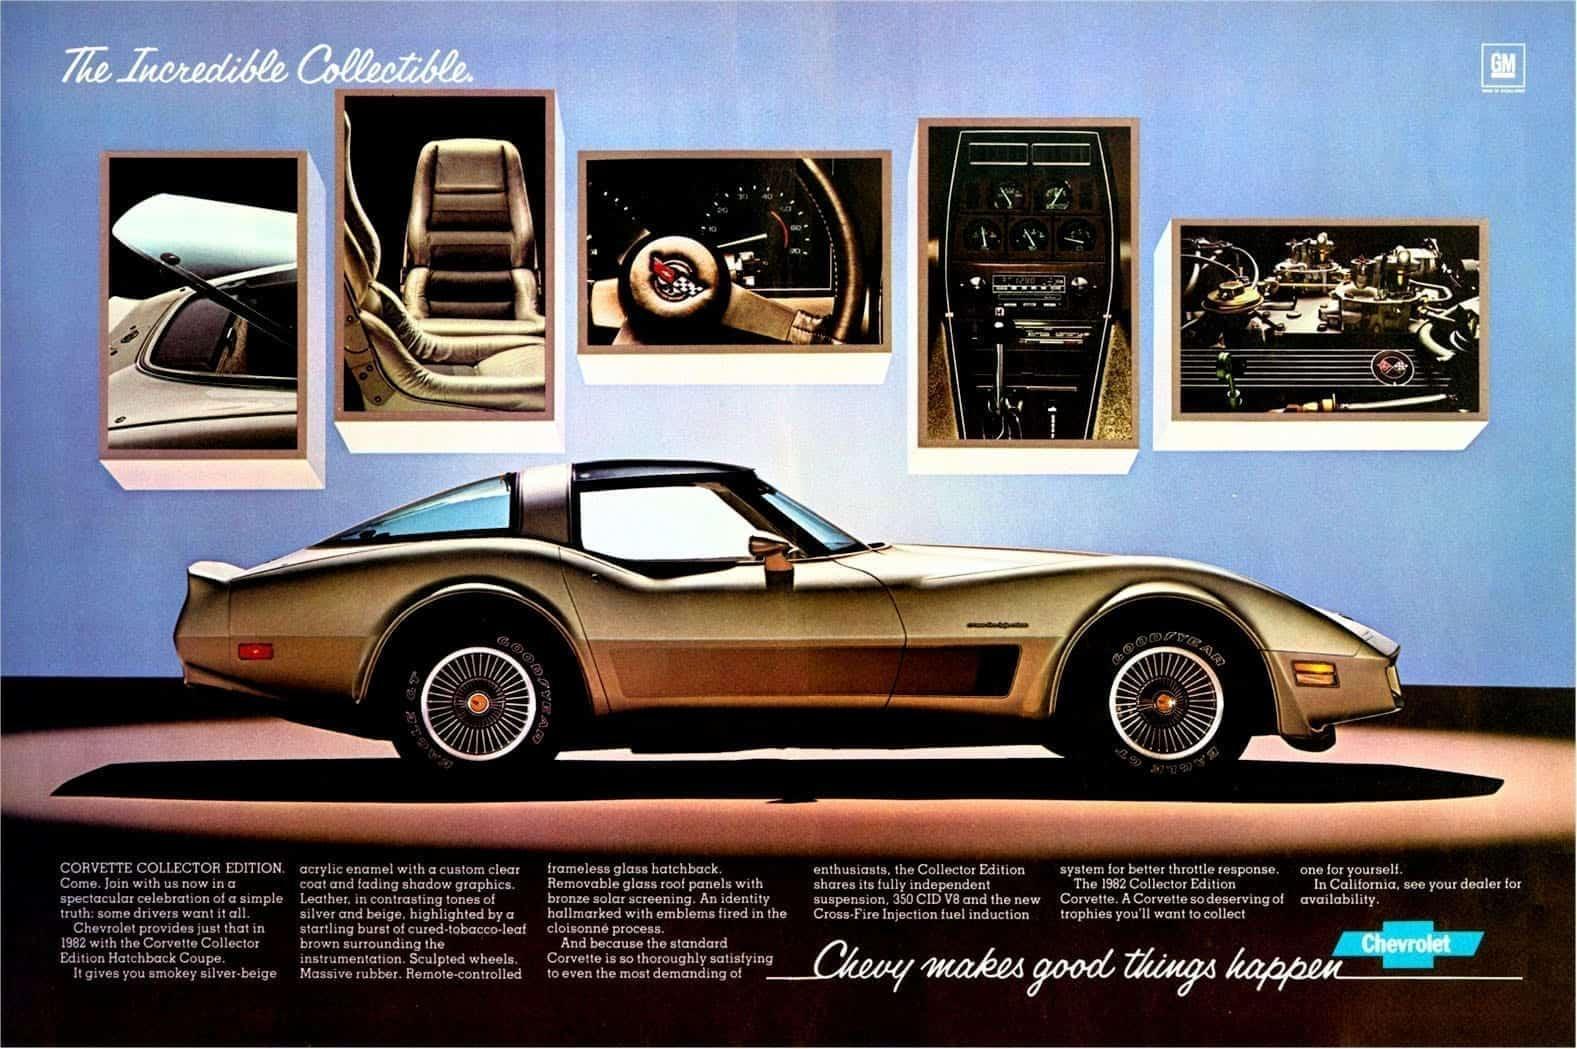 1982 corvette the incredible collectible model